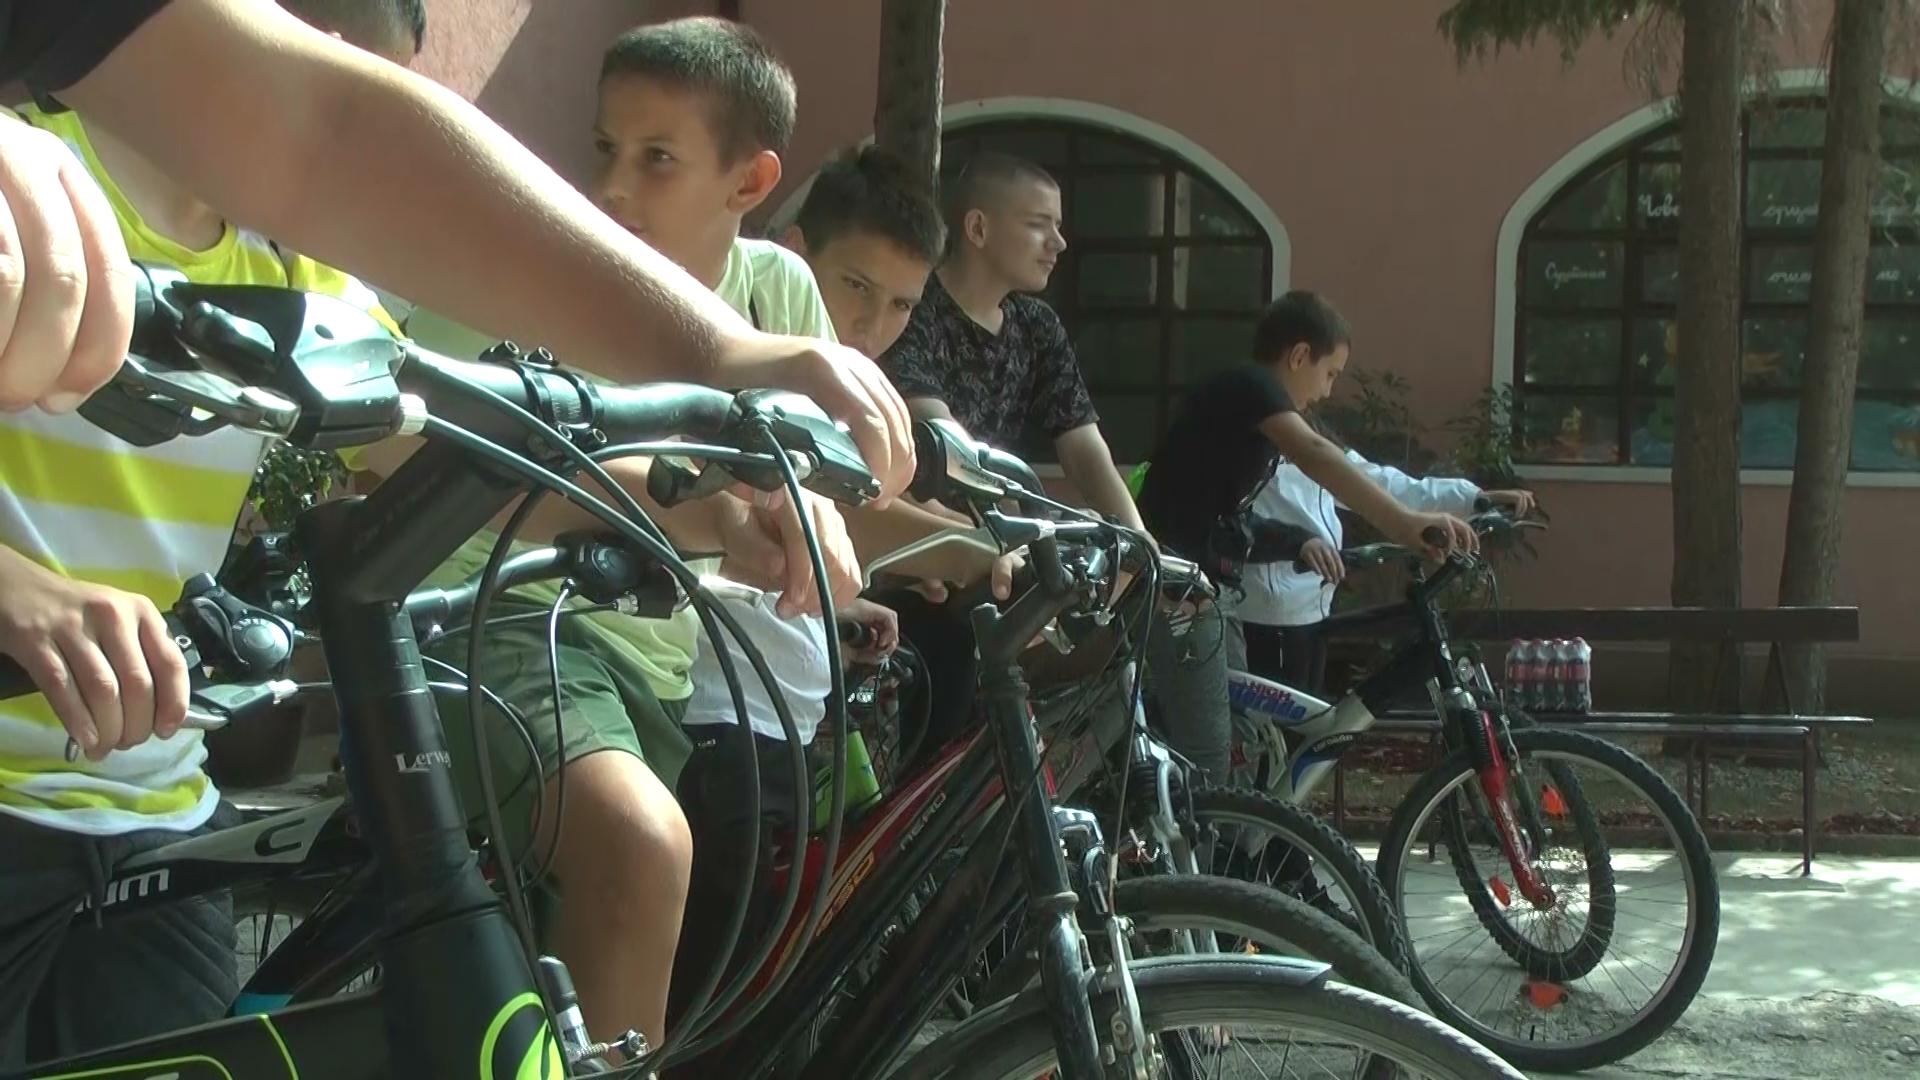 EVROPSKA NEDELJA MOBILNOSTI: Đaci vozili bicikle od Velikog Šiljegovca do Zebice